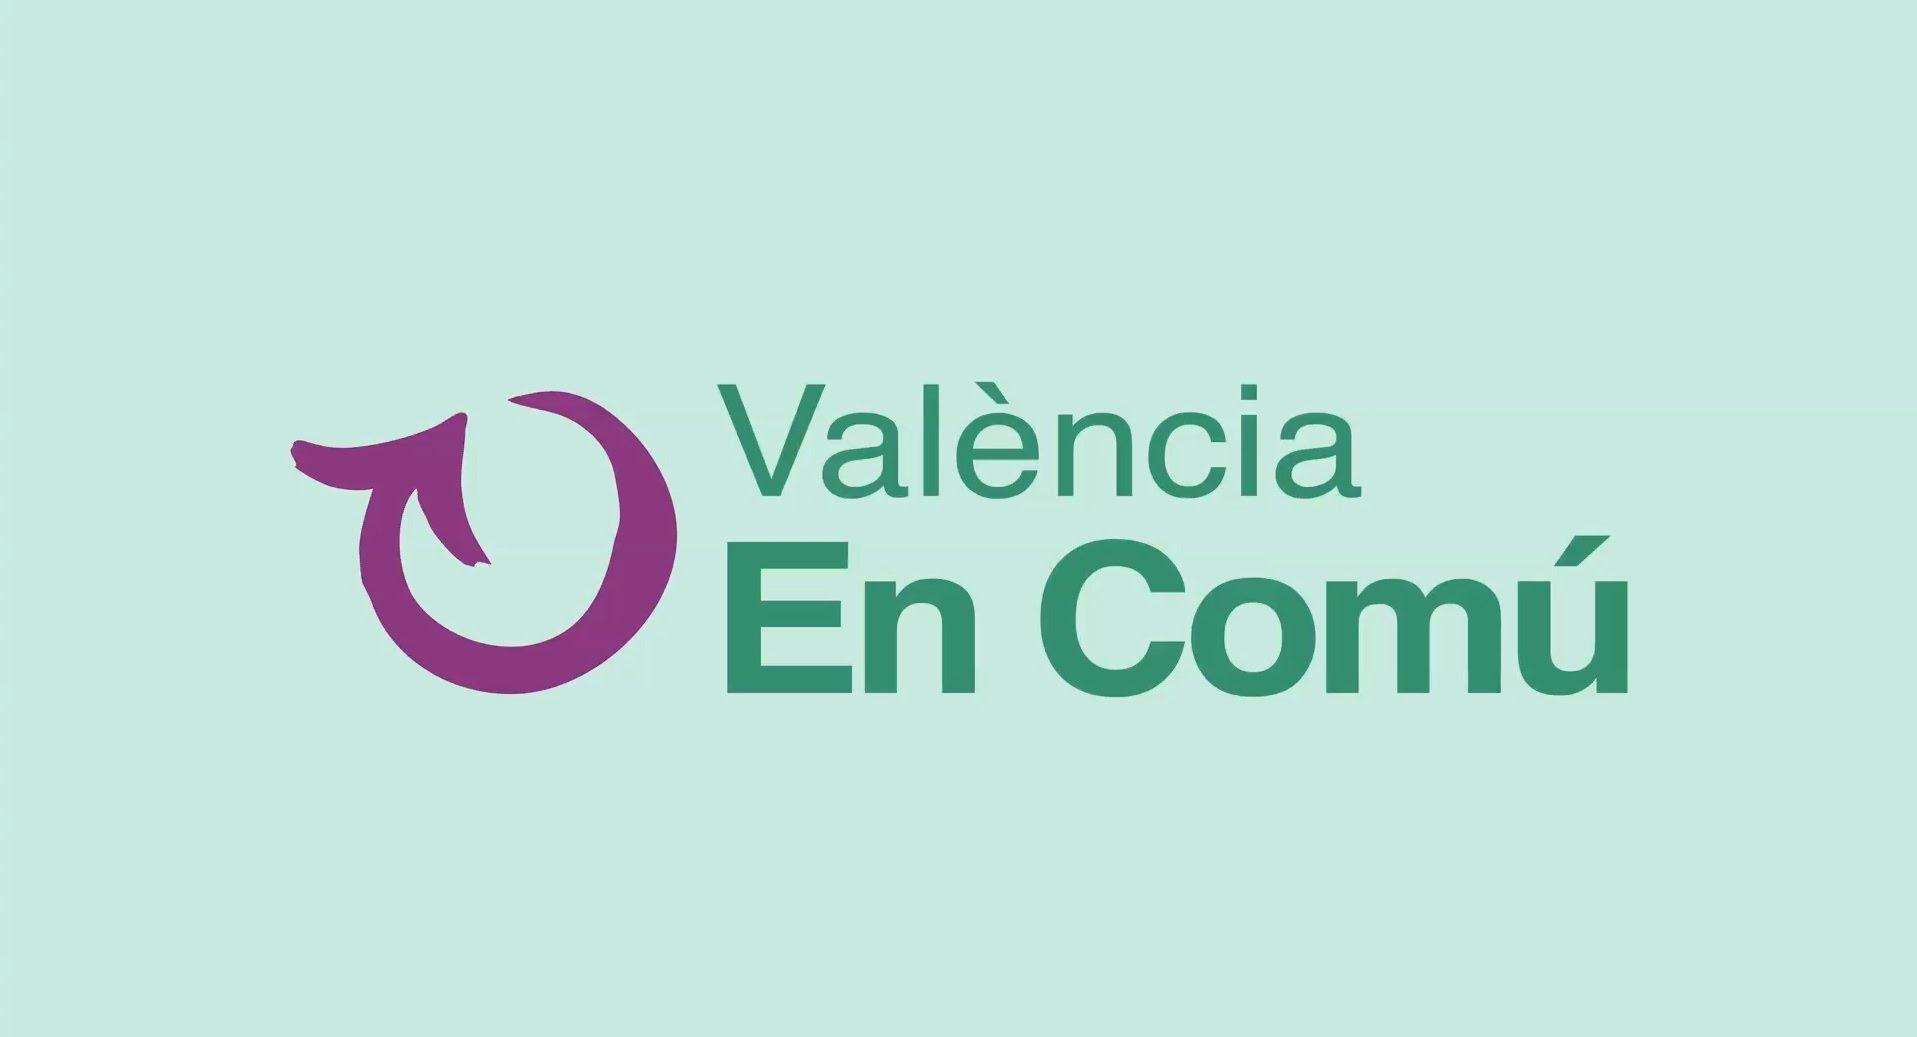 València en Comú